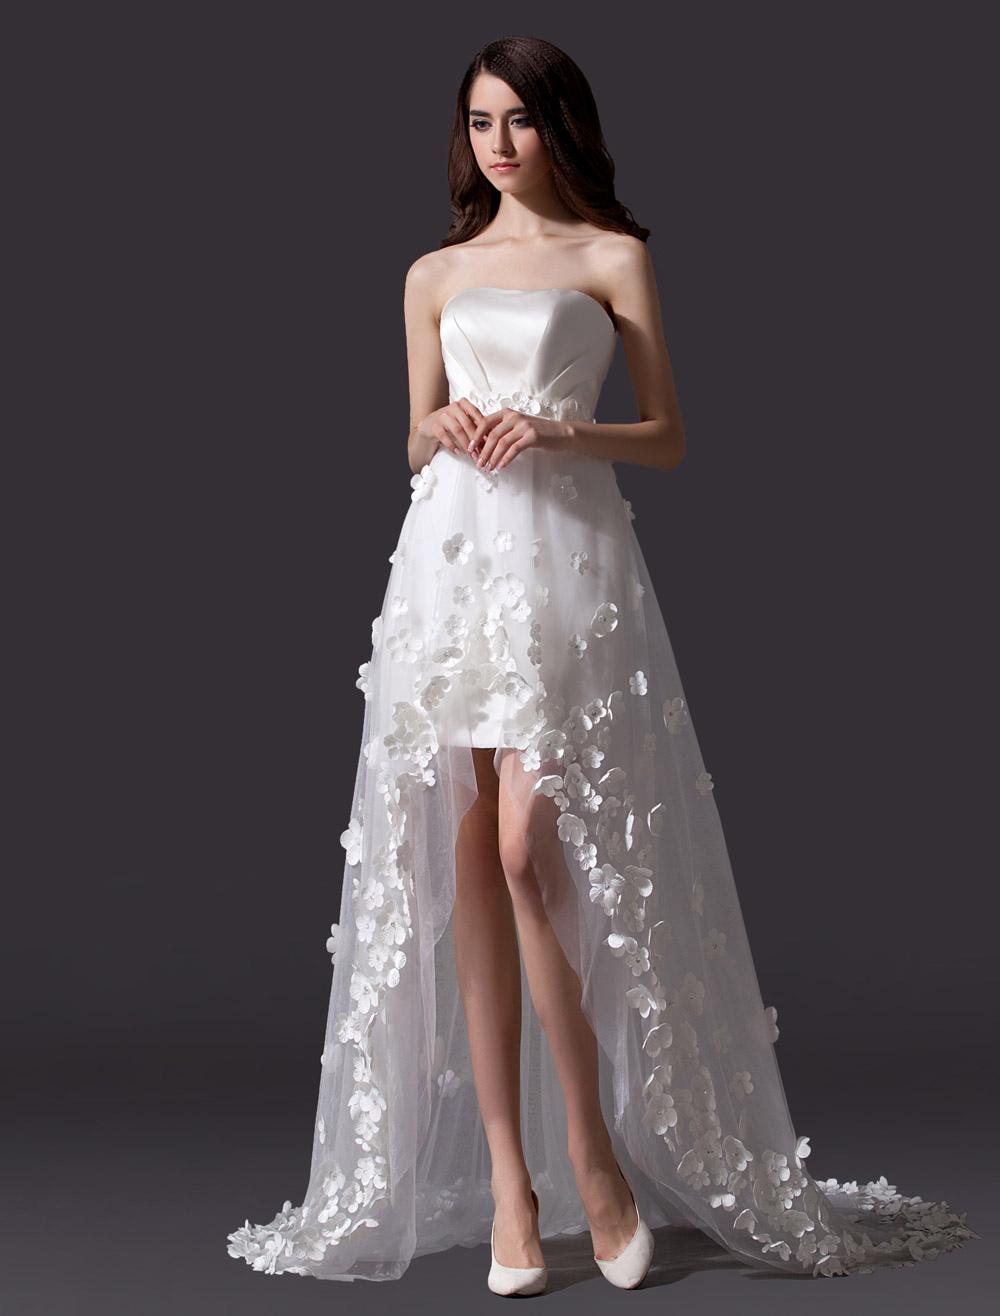 High Low Beach Wedding Dress With Petals